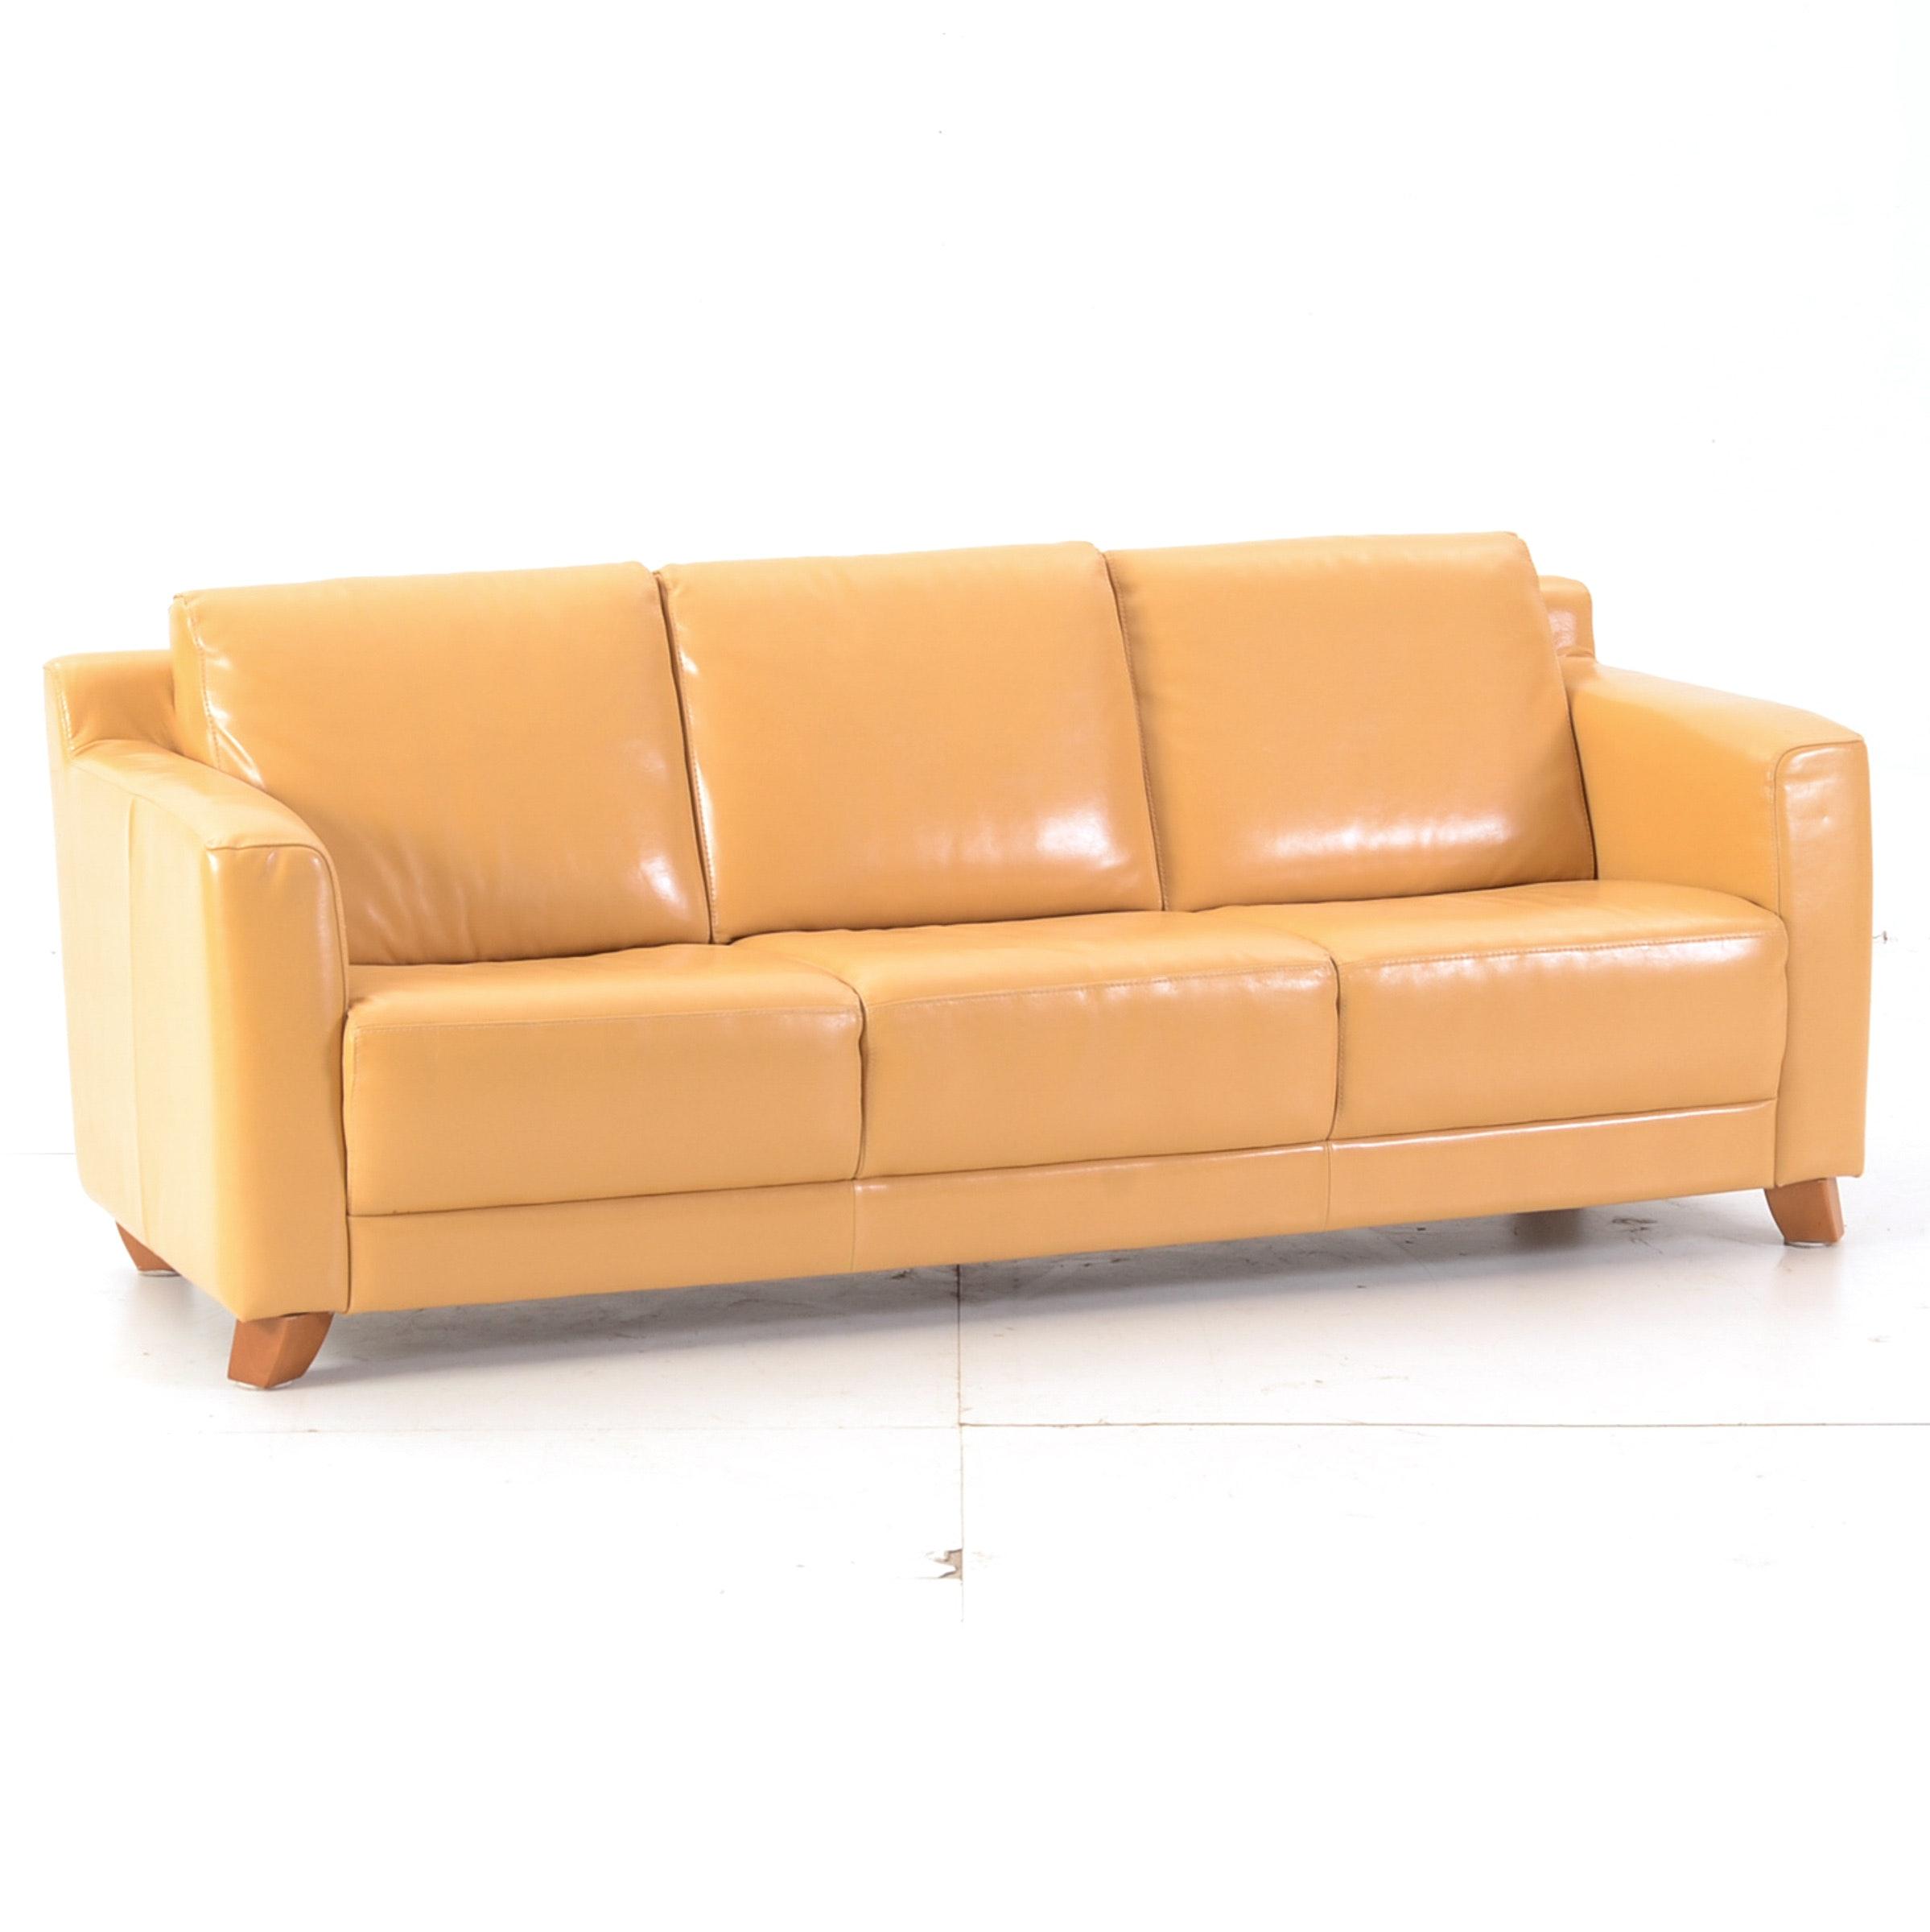 Italian Leather Sofa By Nicoletti ...